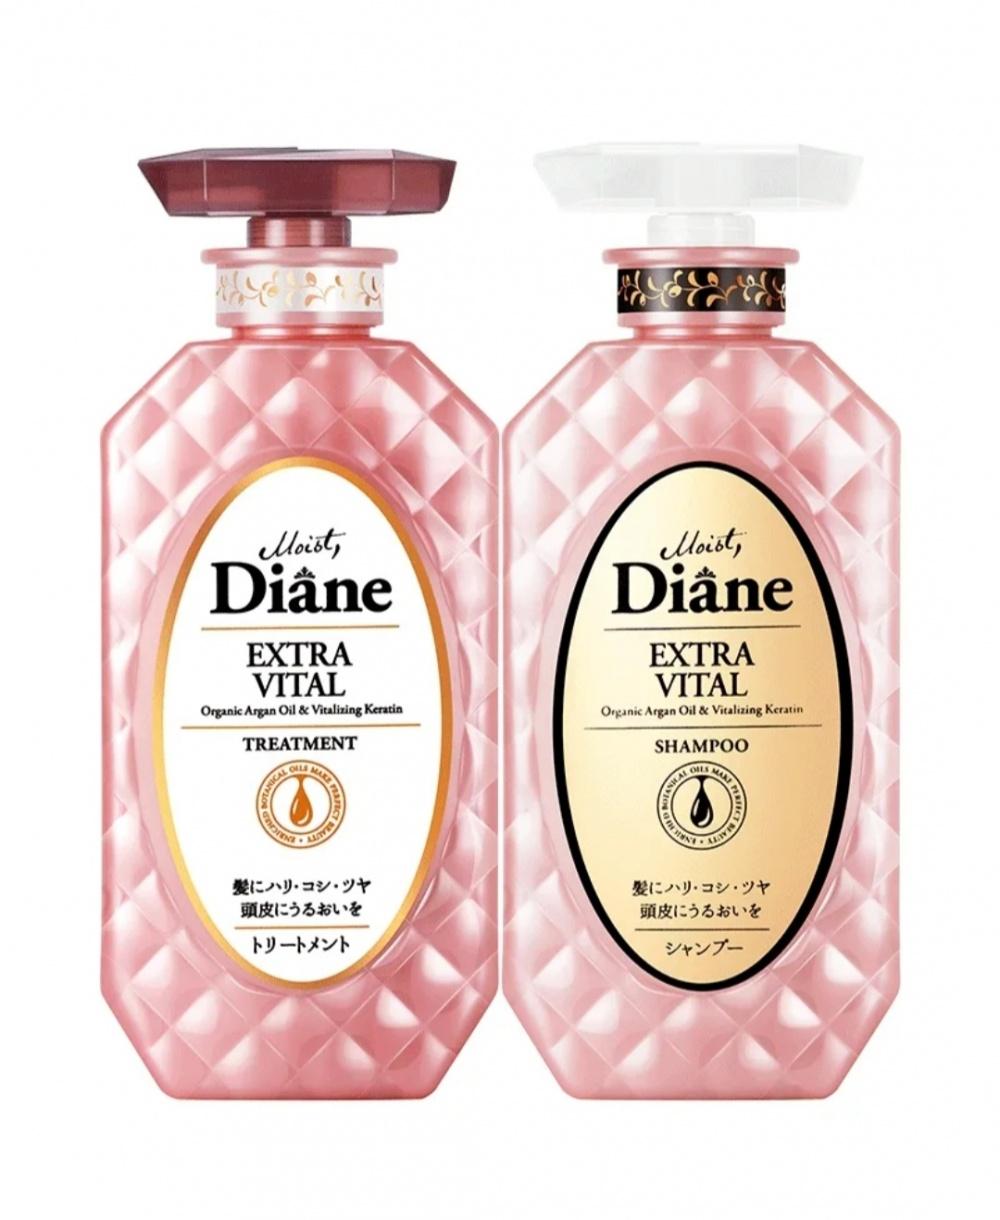 Набор для волос Diane Perfect Beauty, уход за кожей головы, 2*450 мл